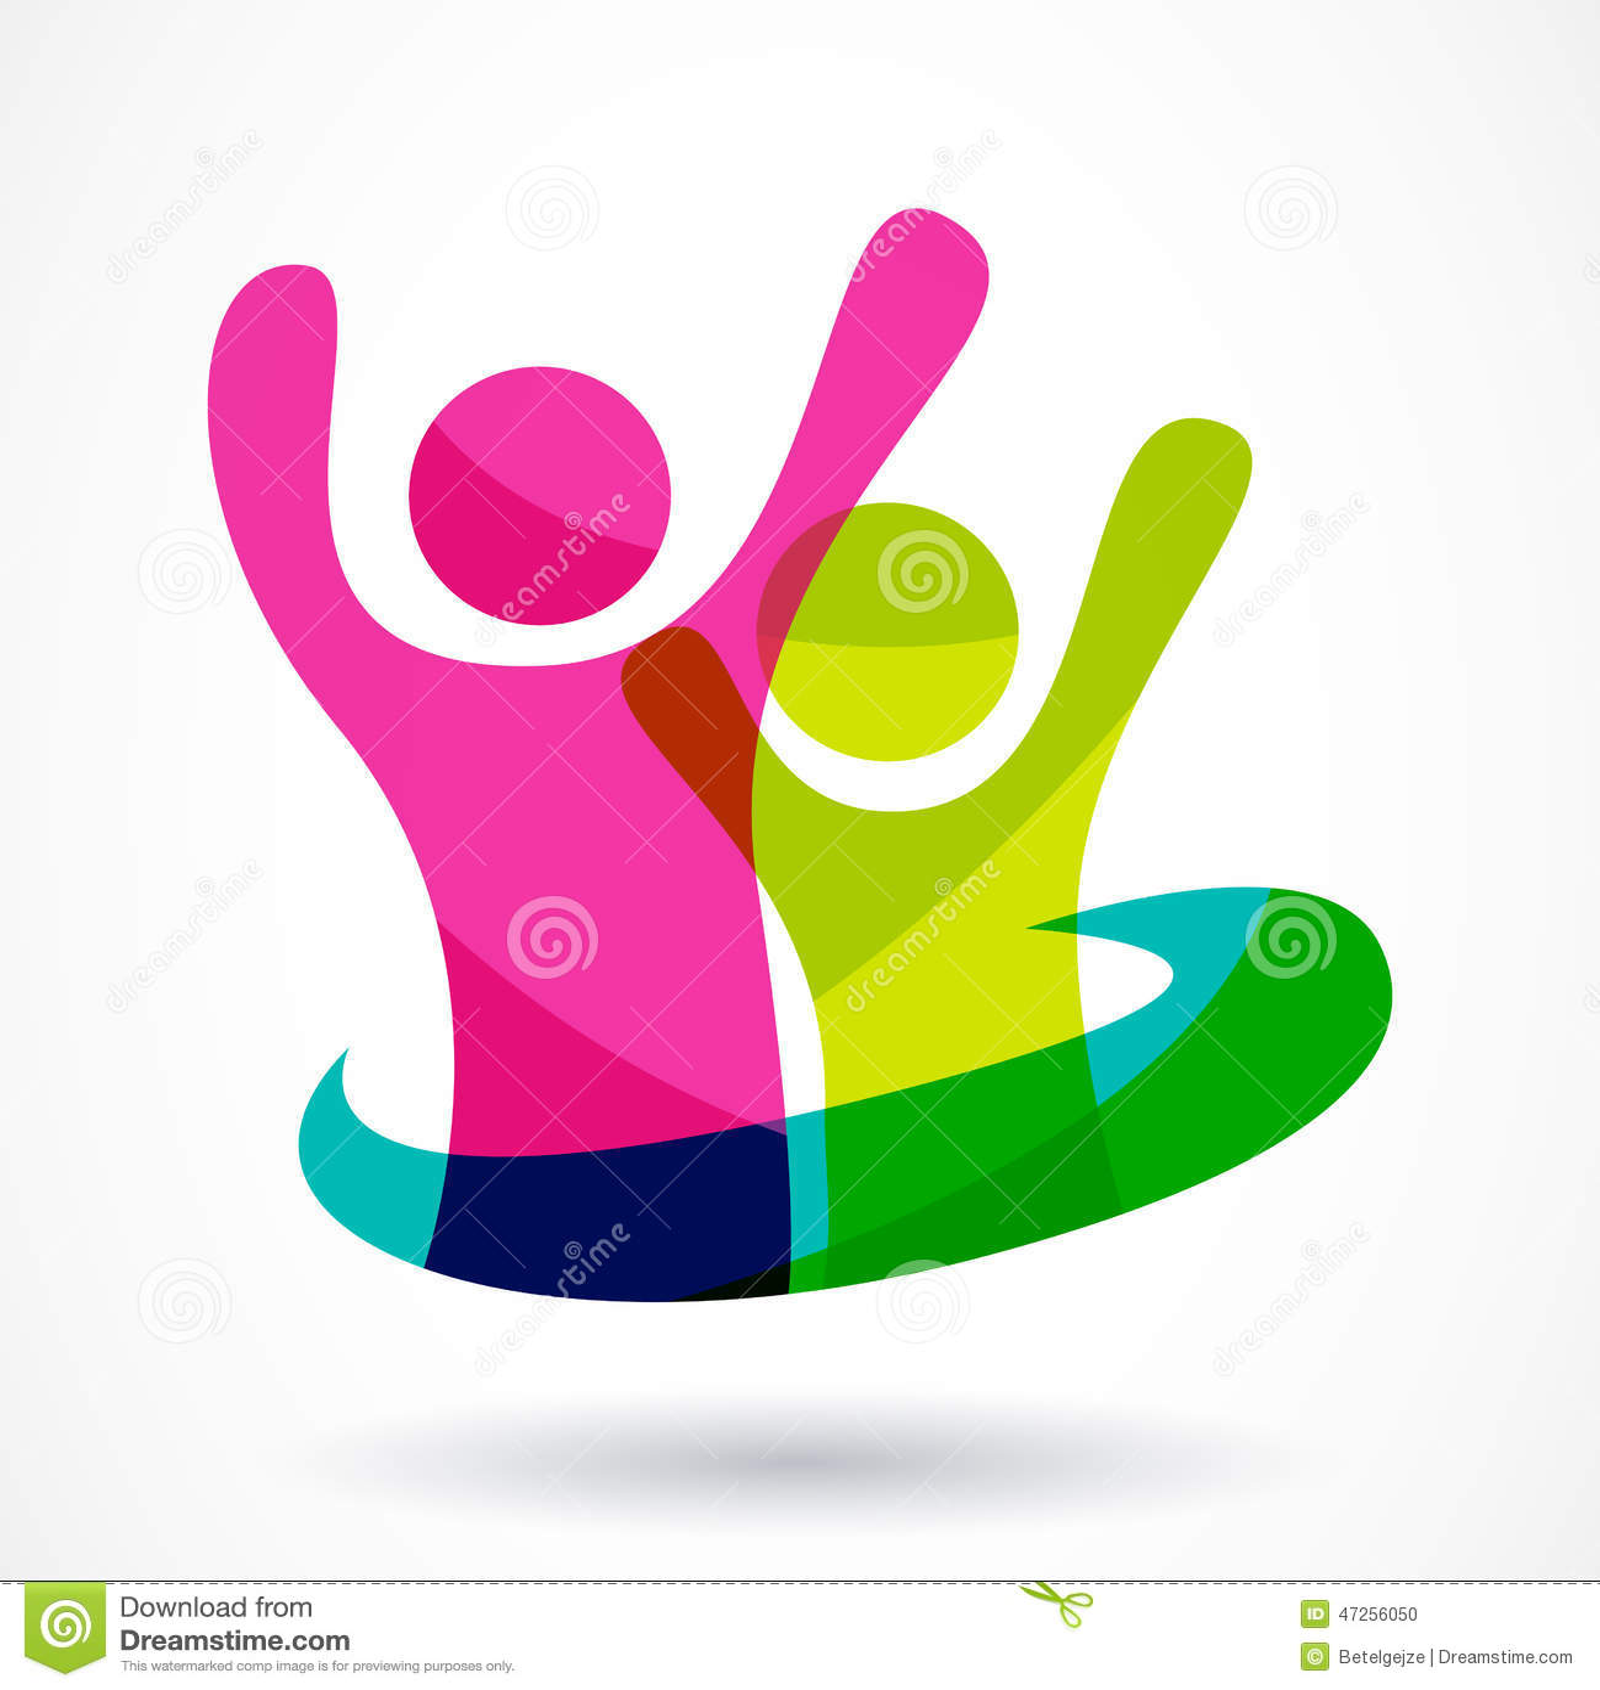 vector-logo-design-template-colorful-abstract-happy-people-illu-illustration-concept-social-network-team-work-partnership-47256050.jpg